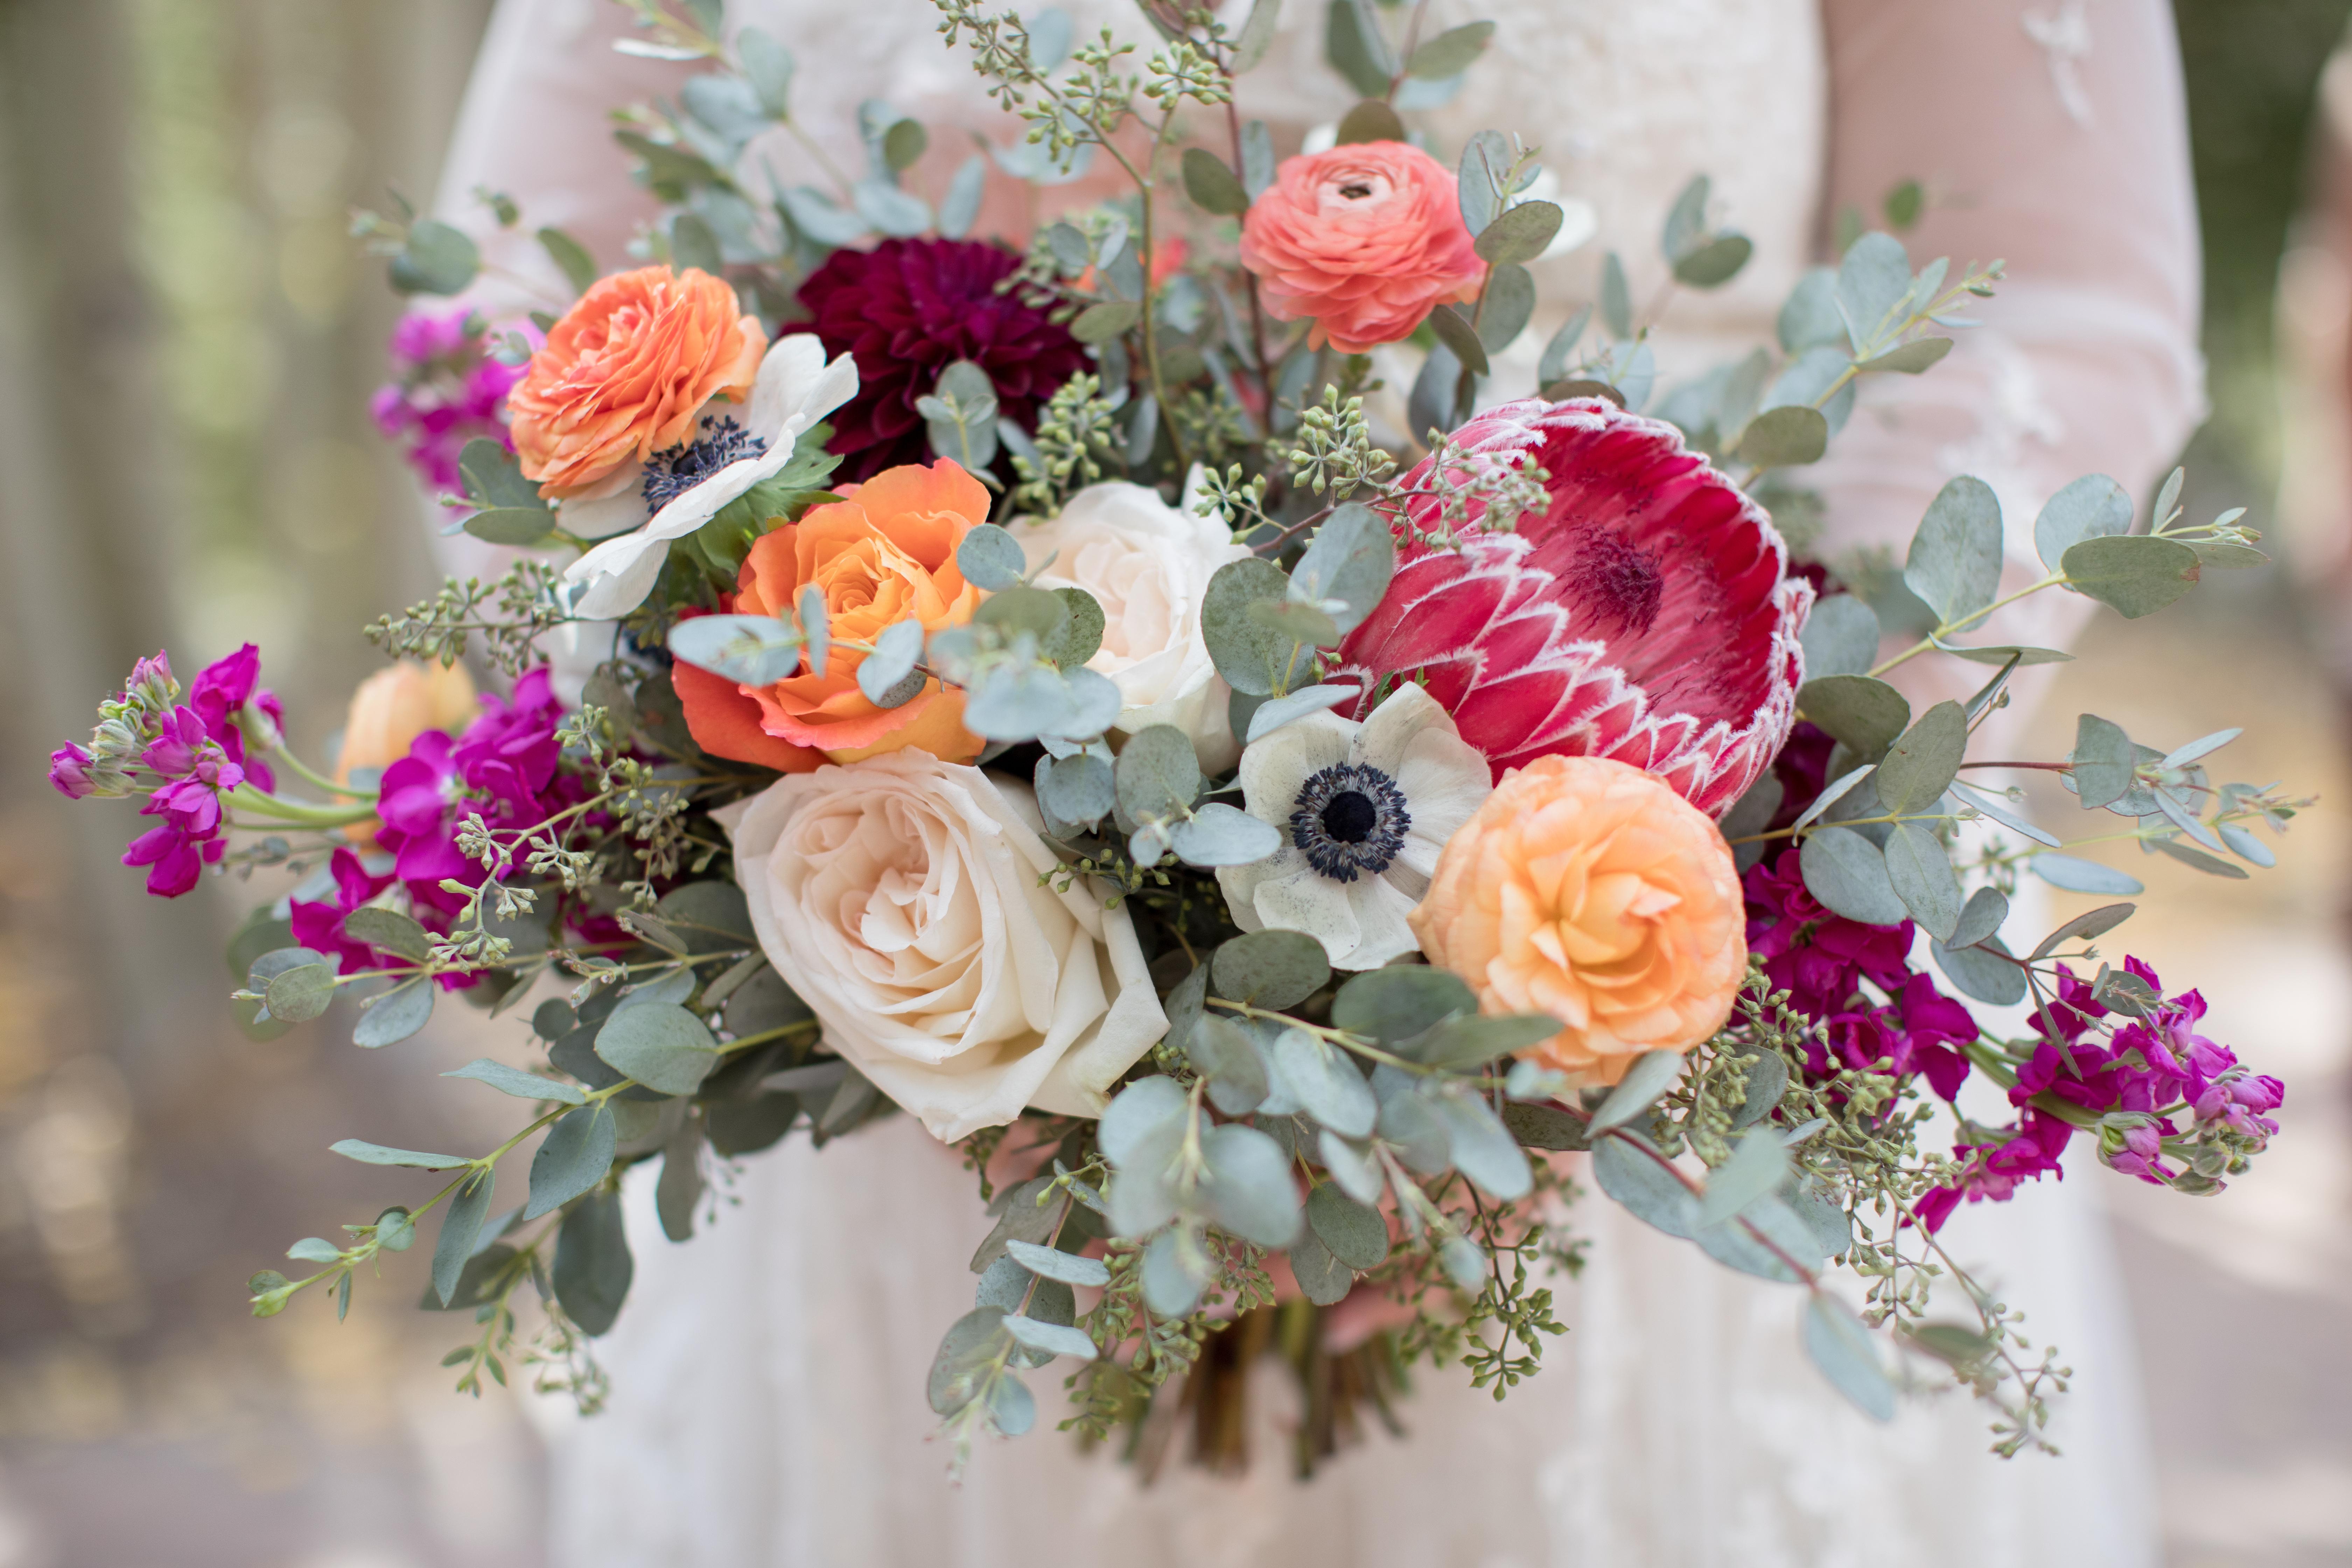 Private-Home-Rental-Wedding-VRBO-Fall-Breckenridge-Colorado-Blue-Lakes-Bride-Bouquet